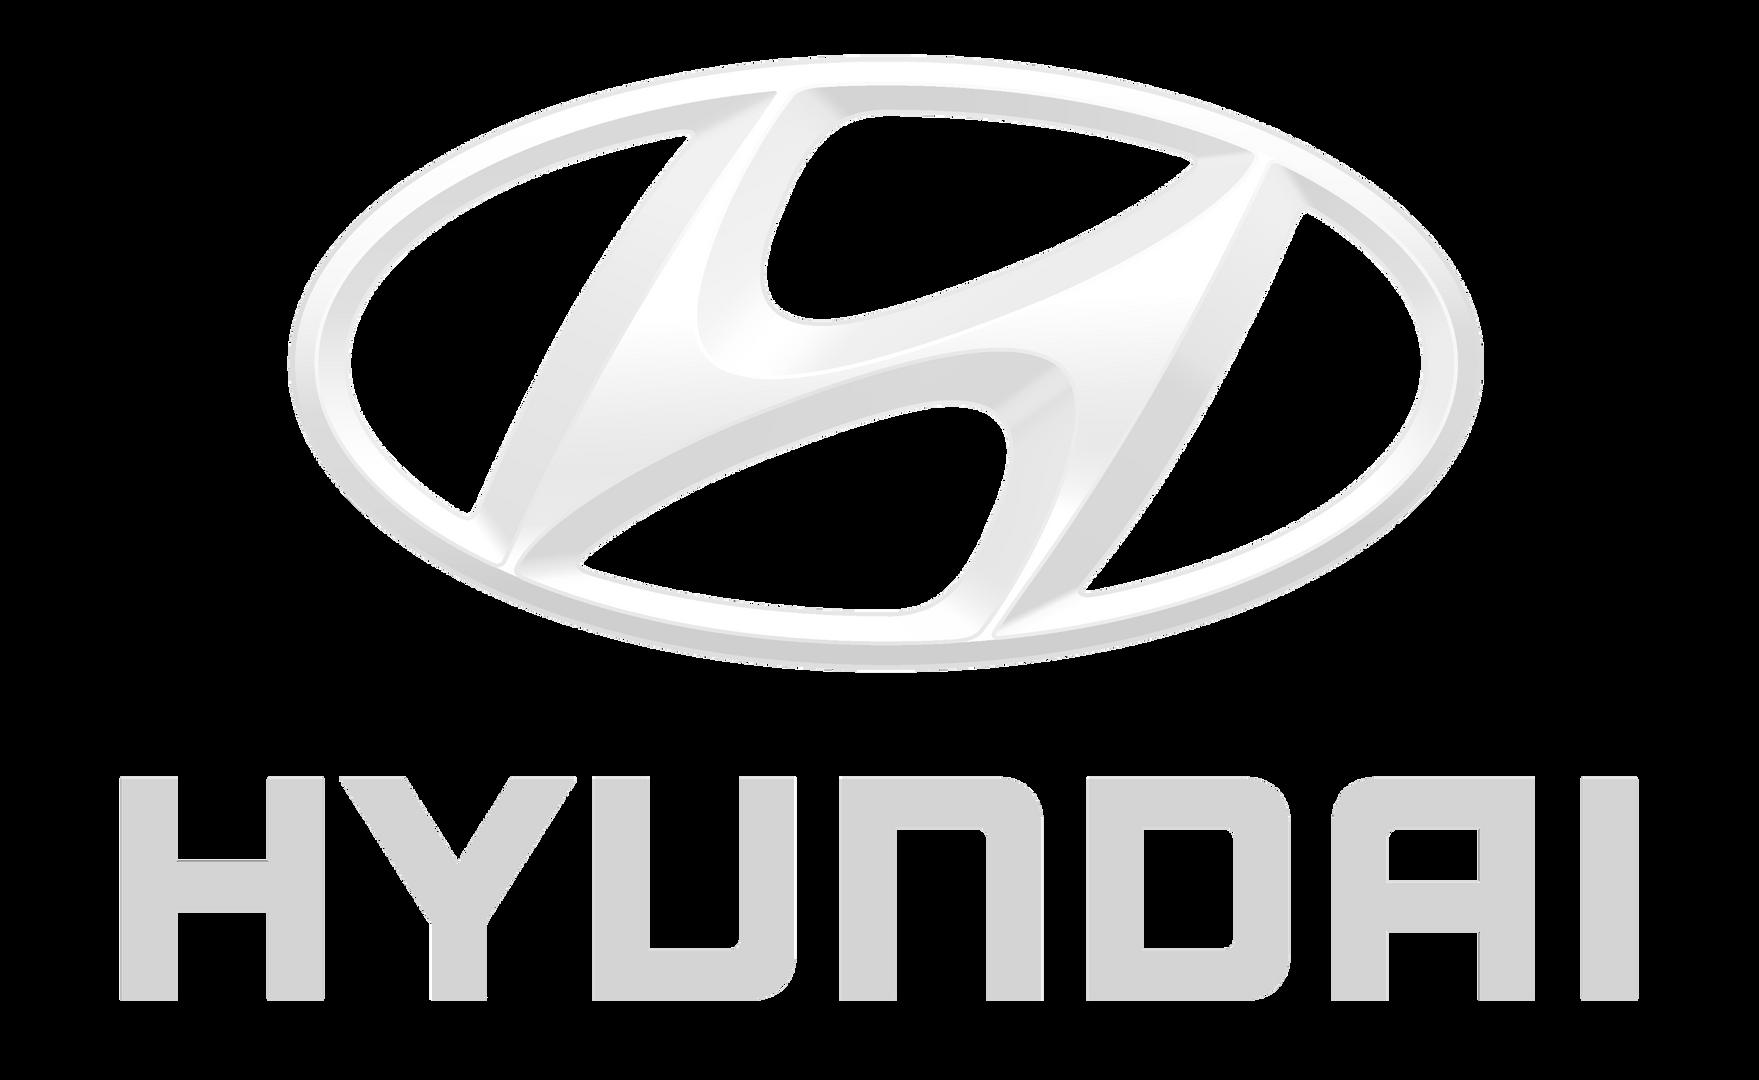 hyundai-logo-0_edited.png